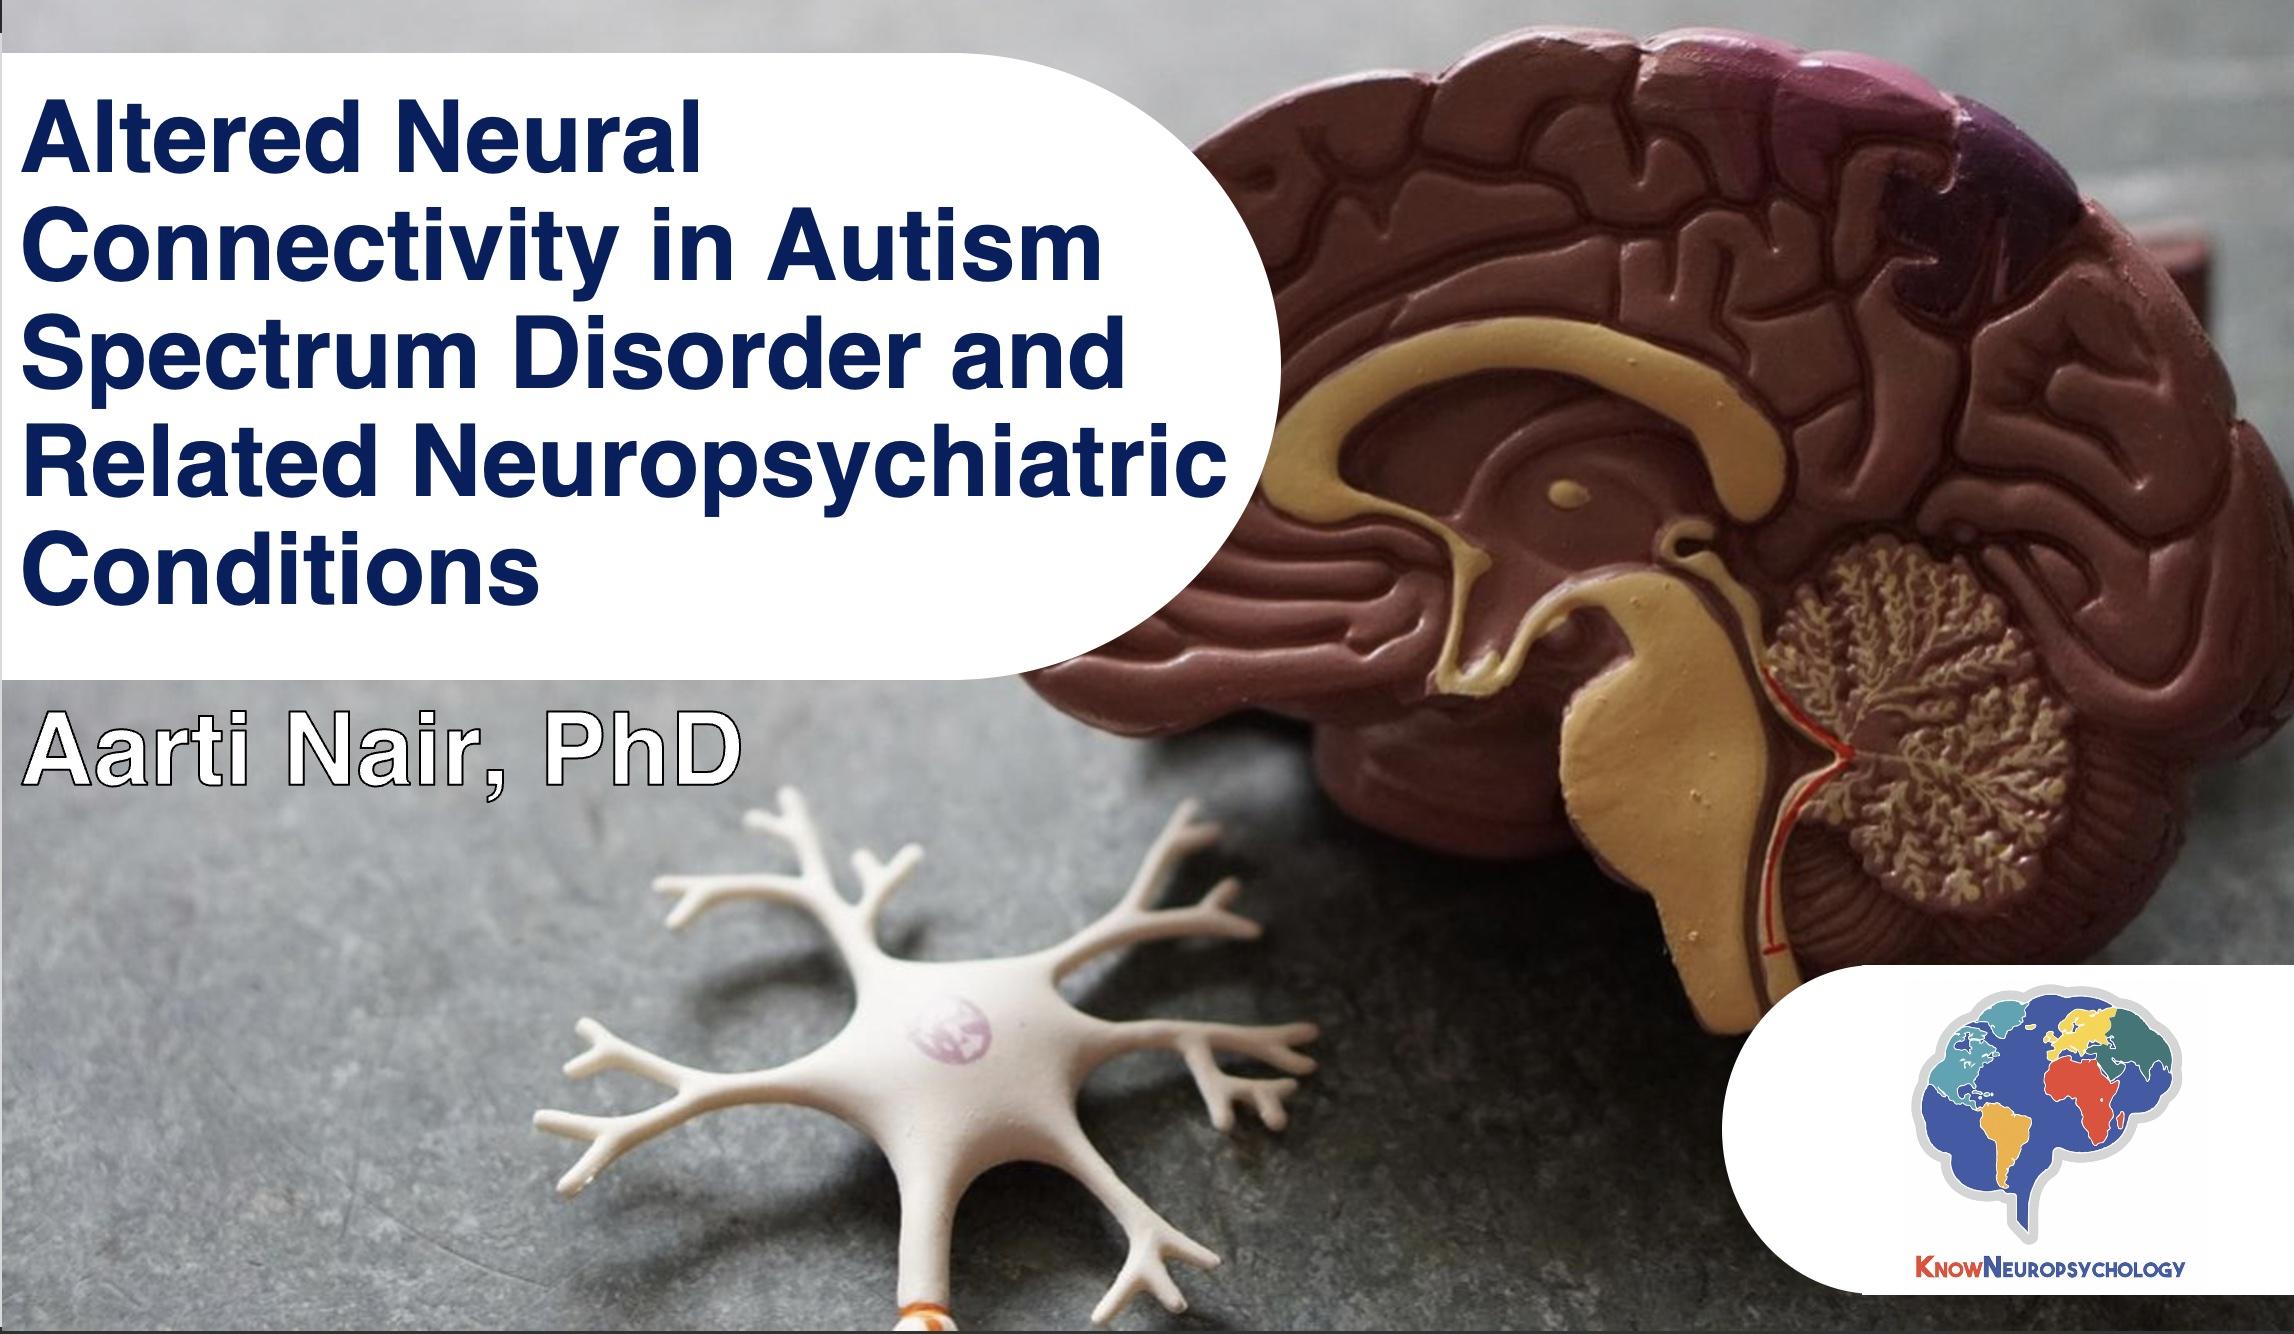 https://knowneuropsych.org/neuropsychology-of-asd/